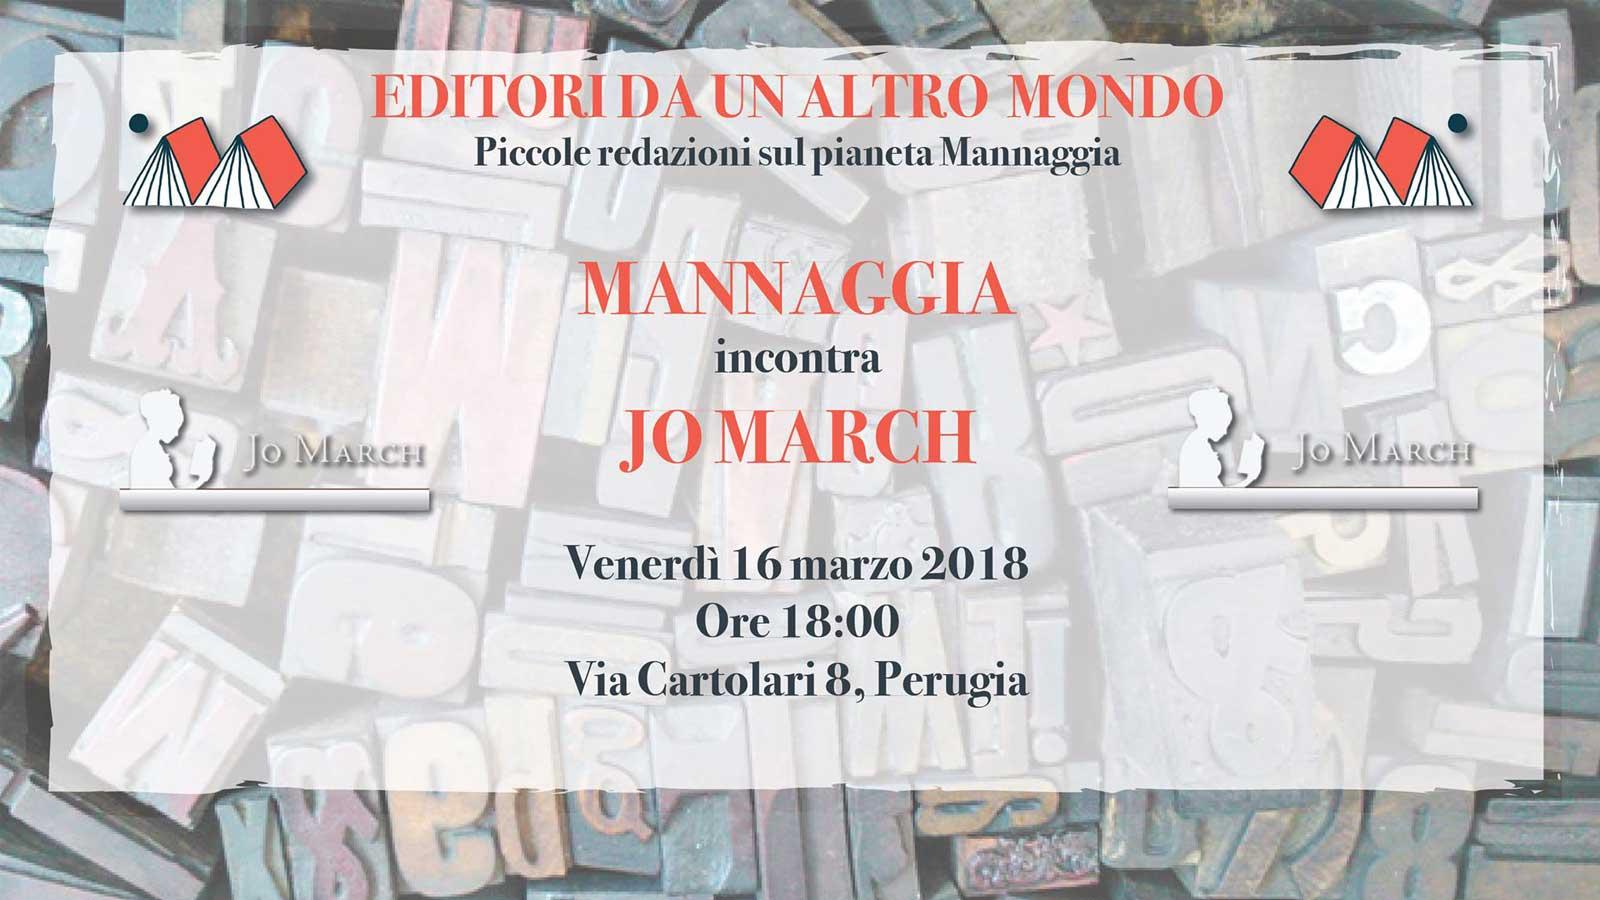 Mannaggia incontra Jo March